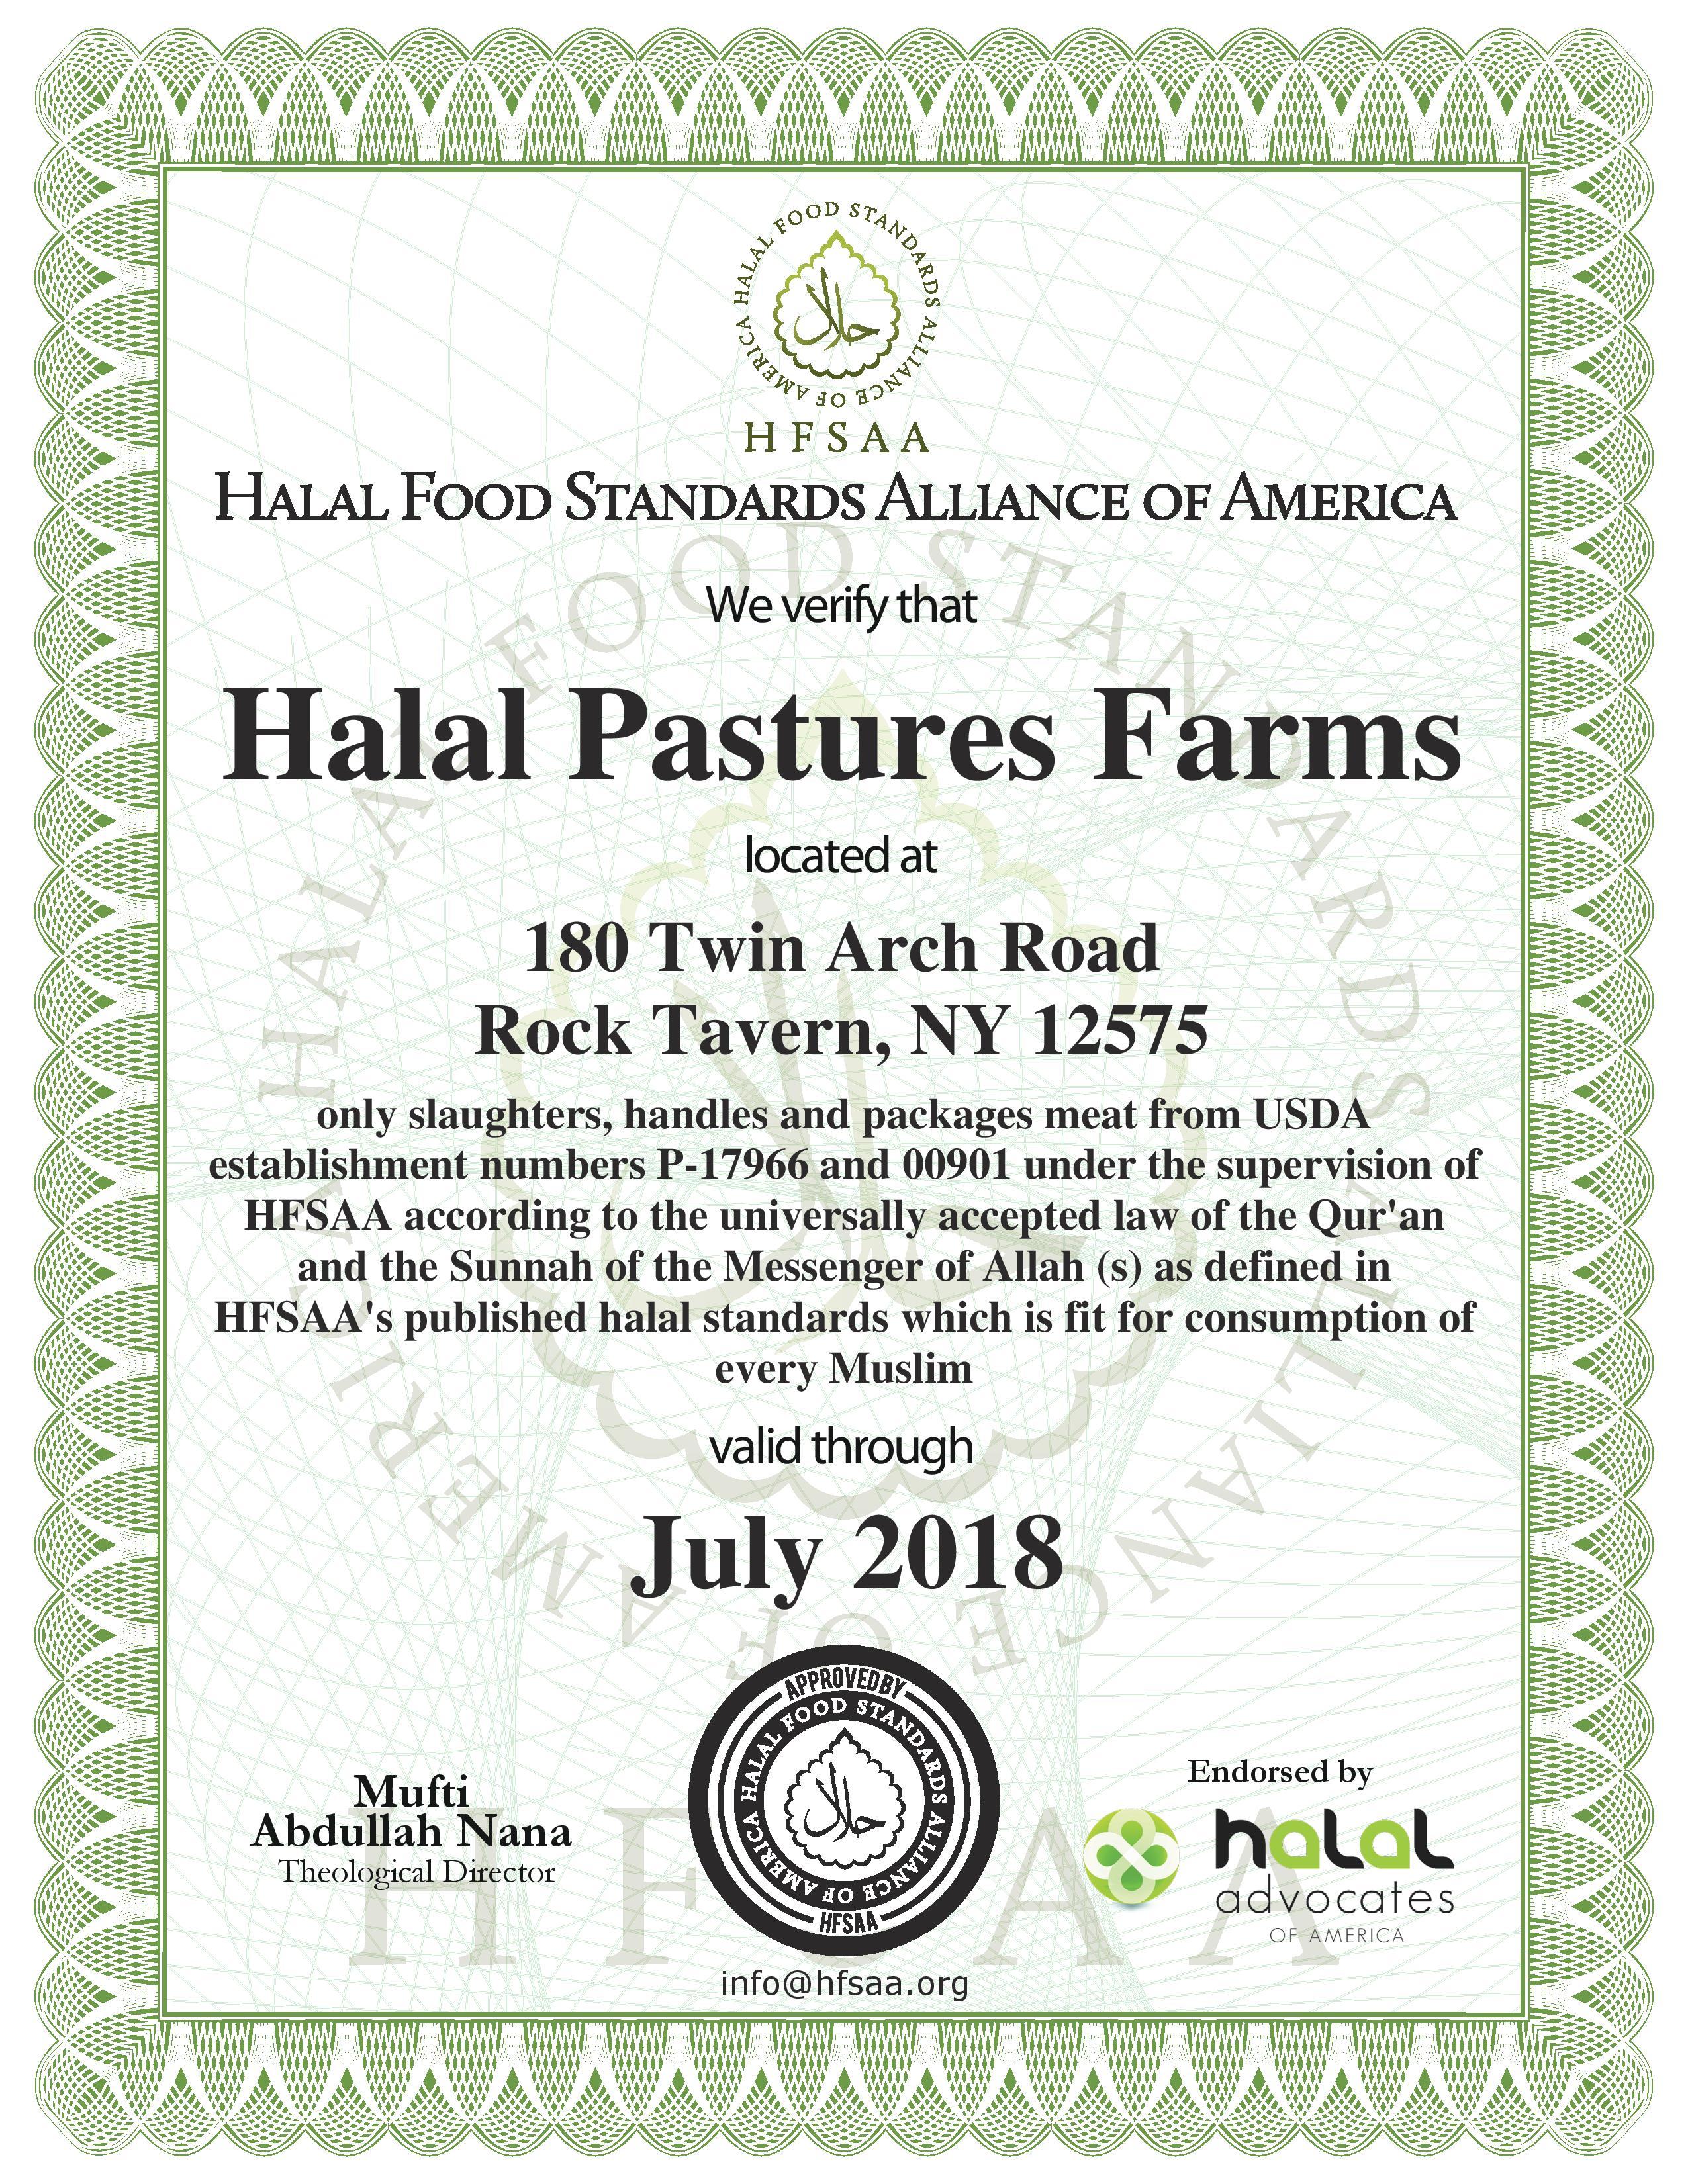 halal-pastures-2018-1-.jpg